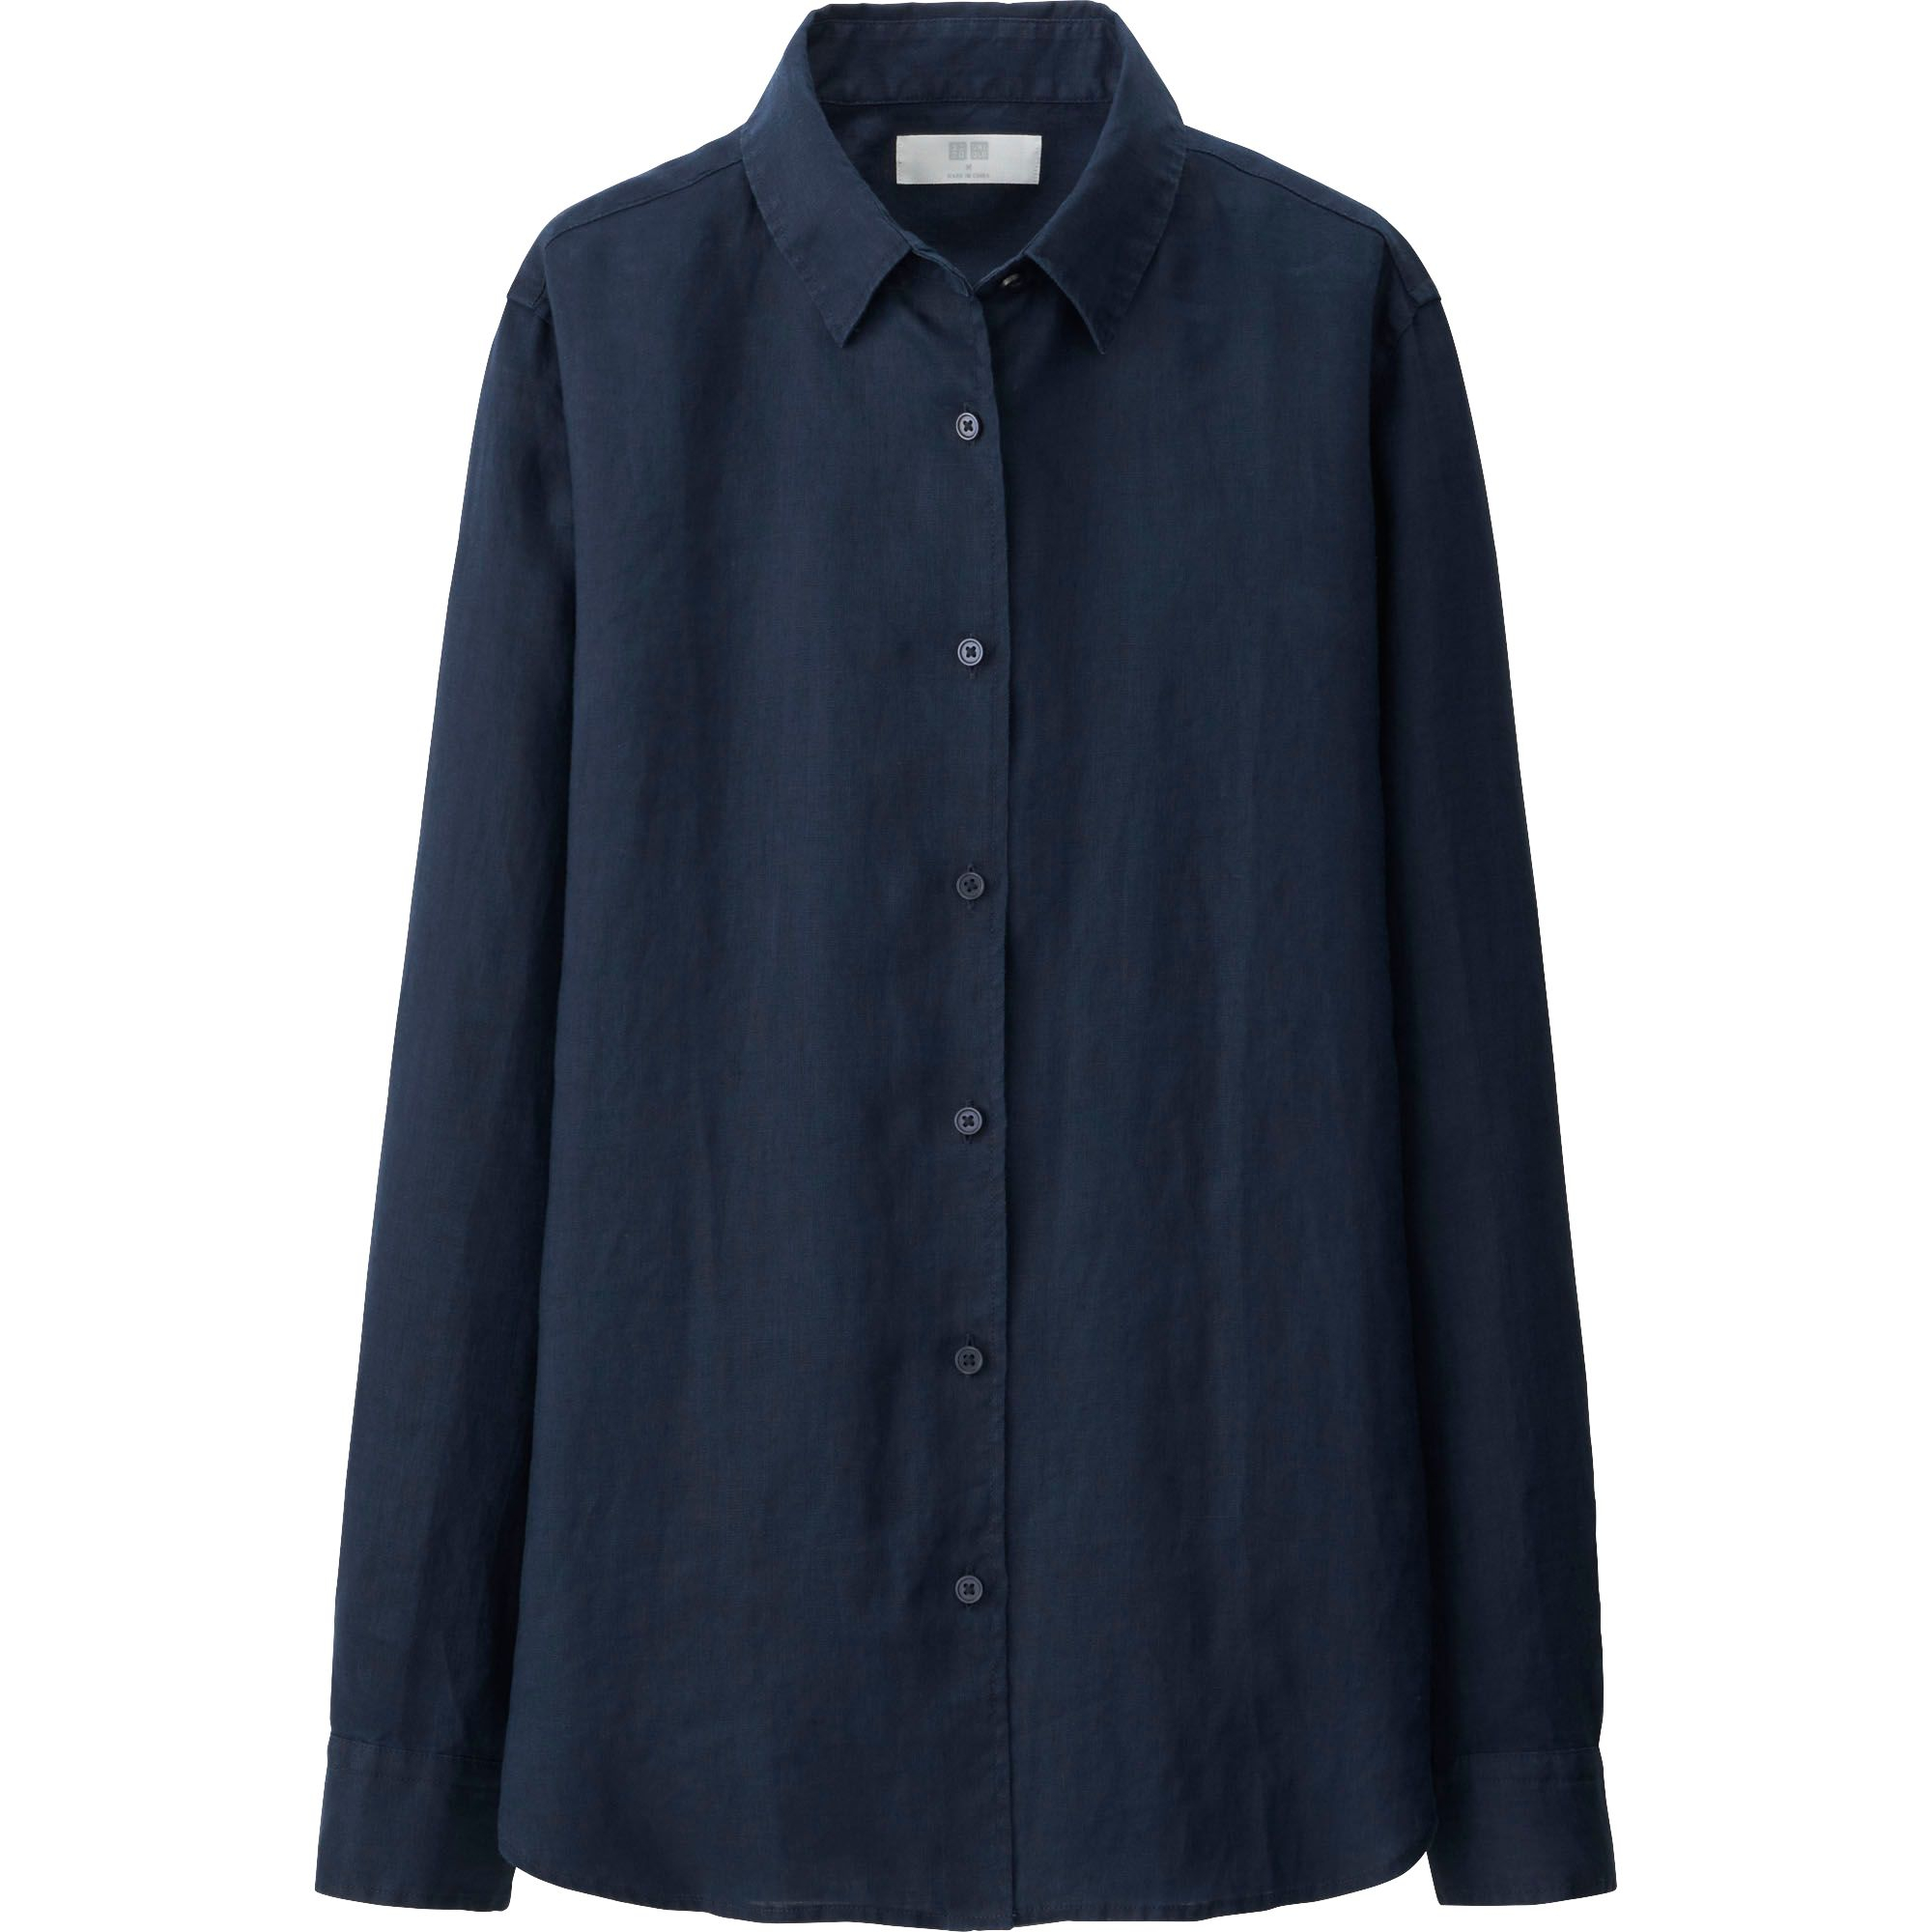 Uniqlo women premium linen long sleeve shirt in blue navy for Uniqlo premium t shirt